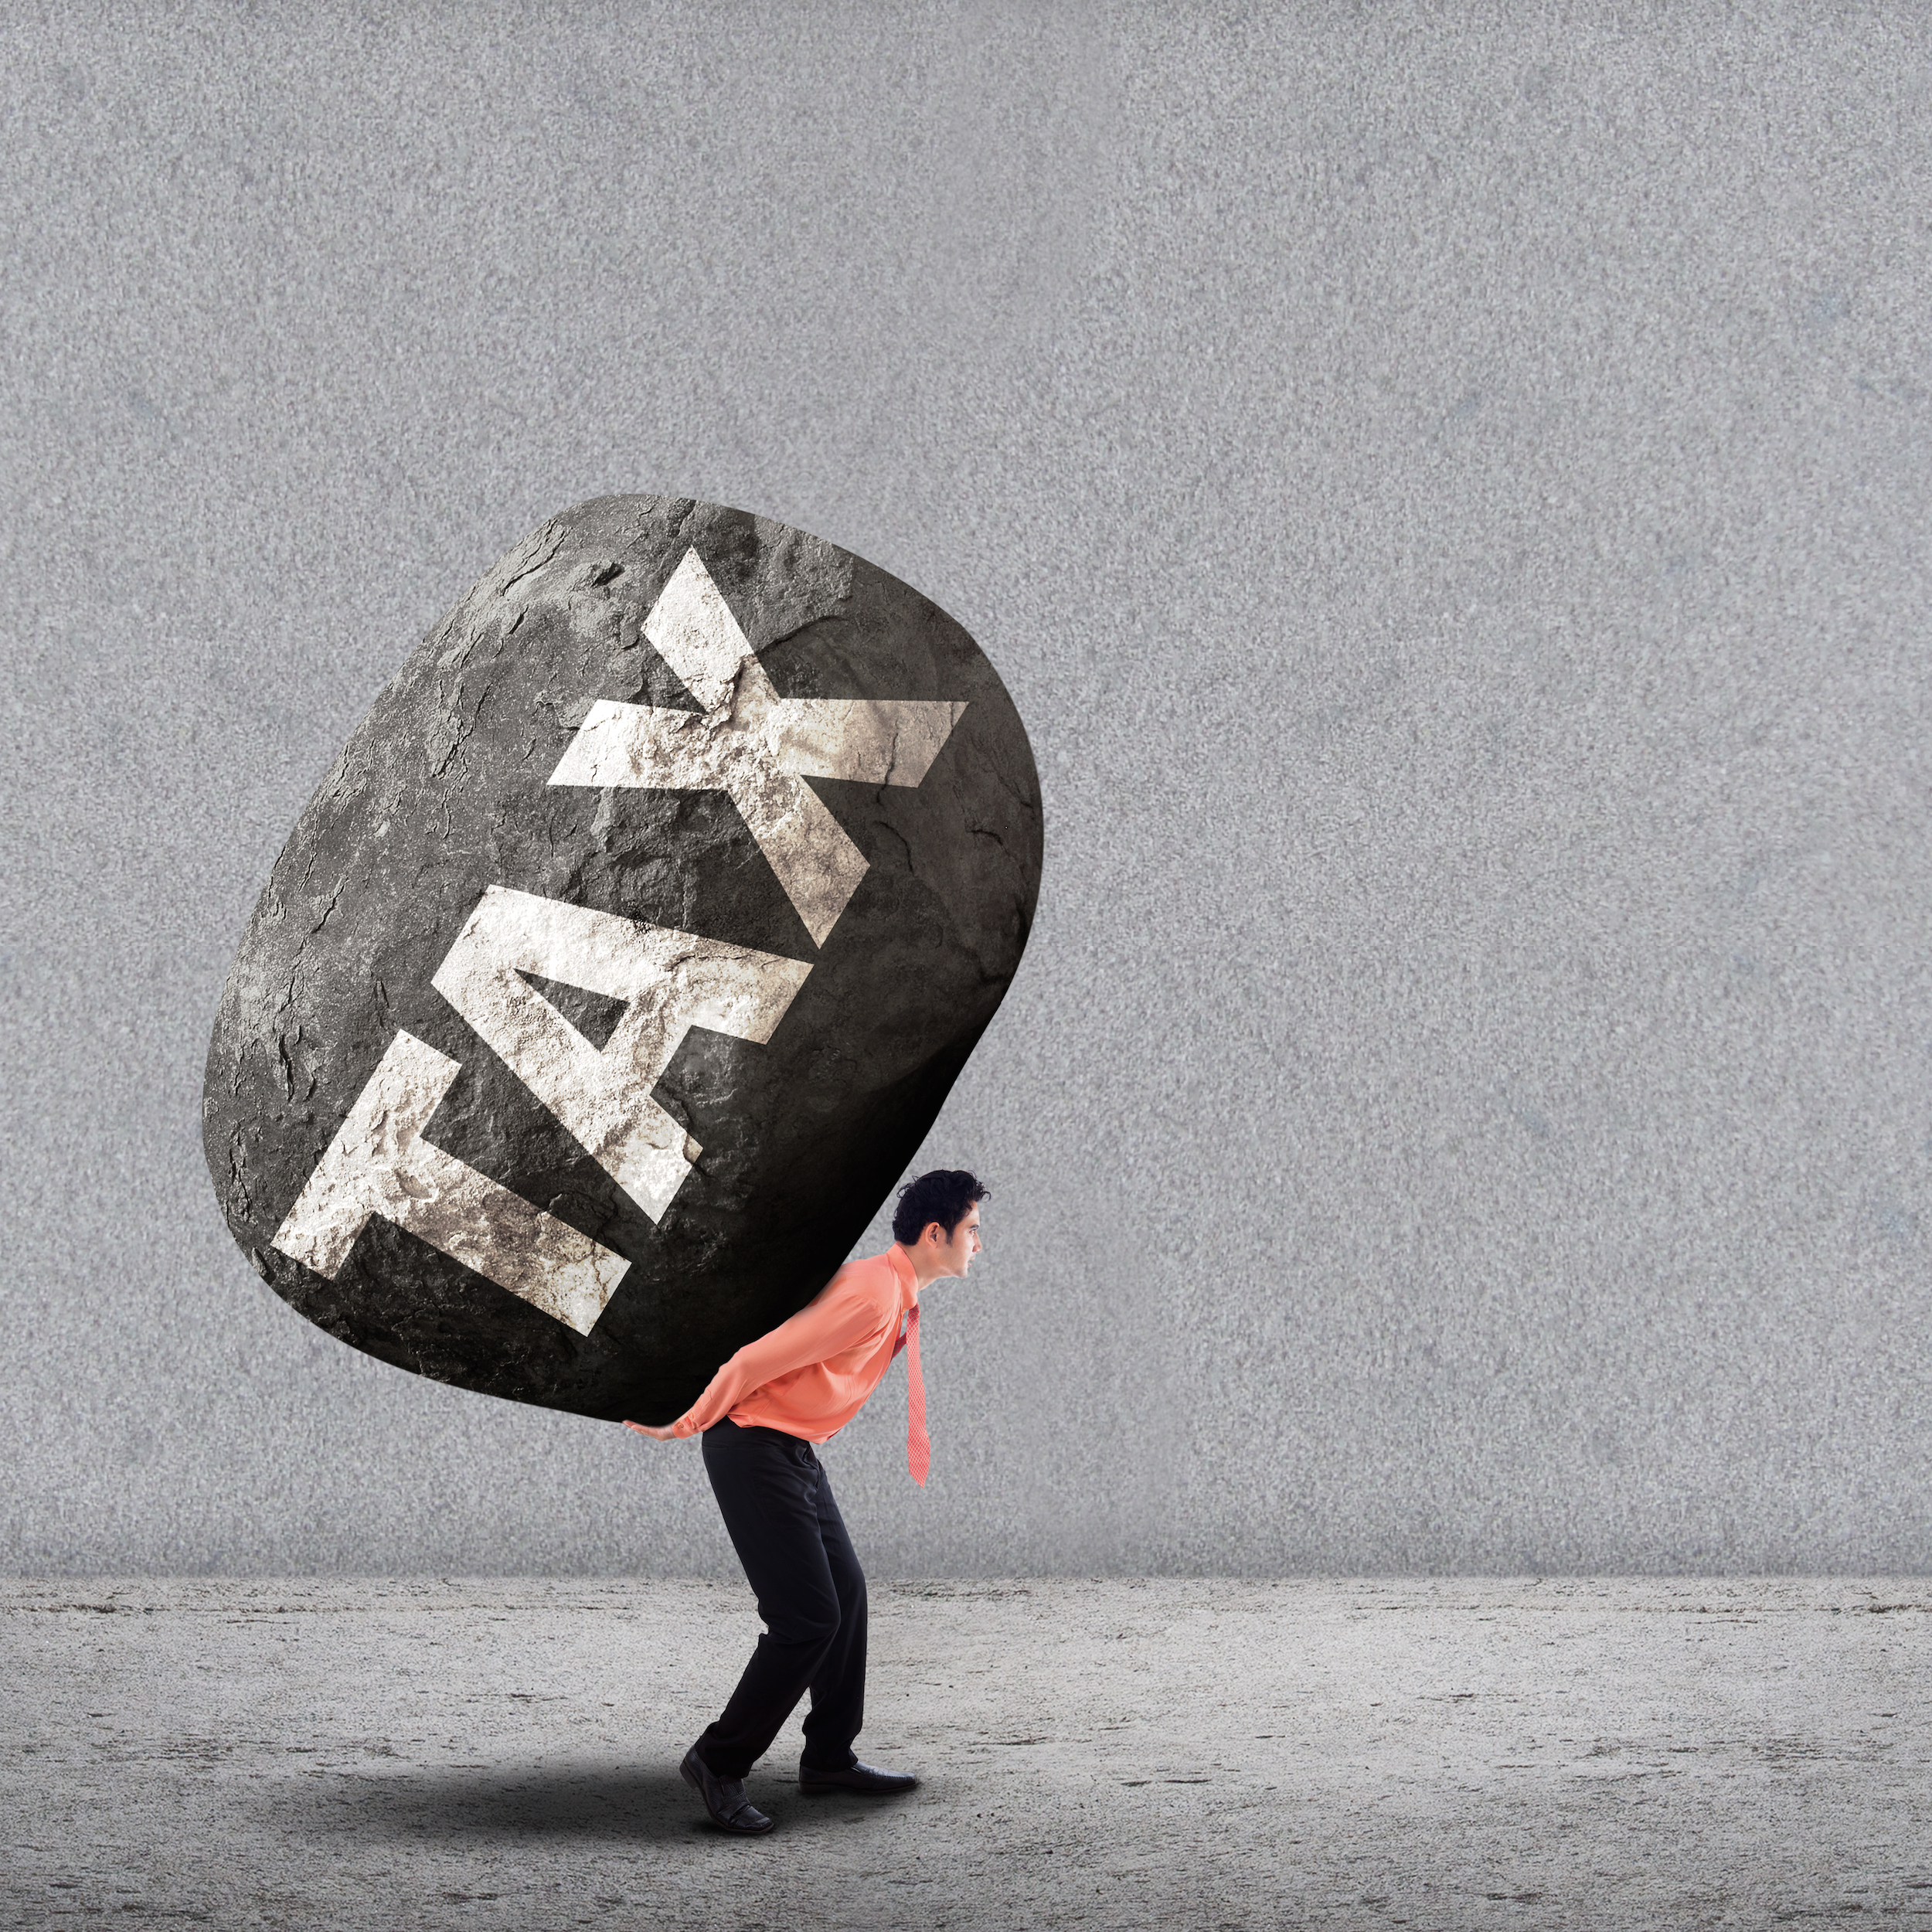 new york has heaviest tax burden in the nation